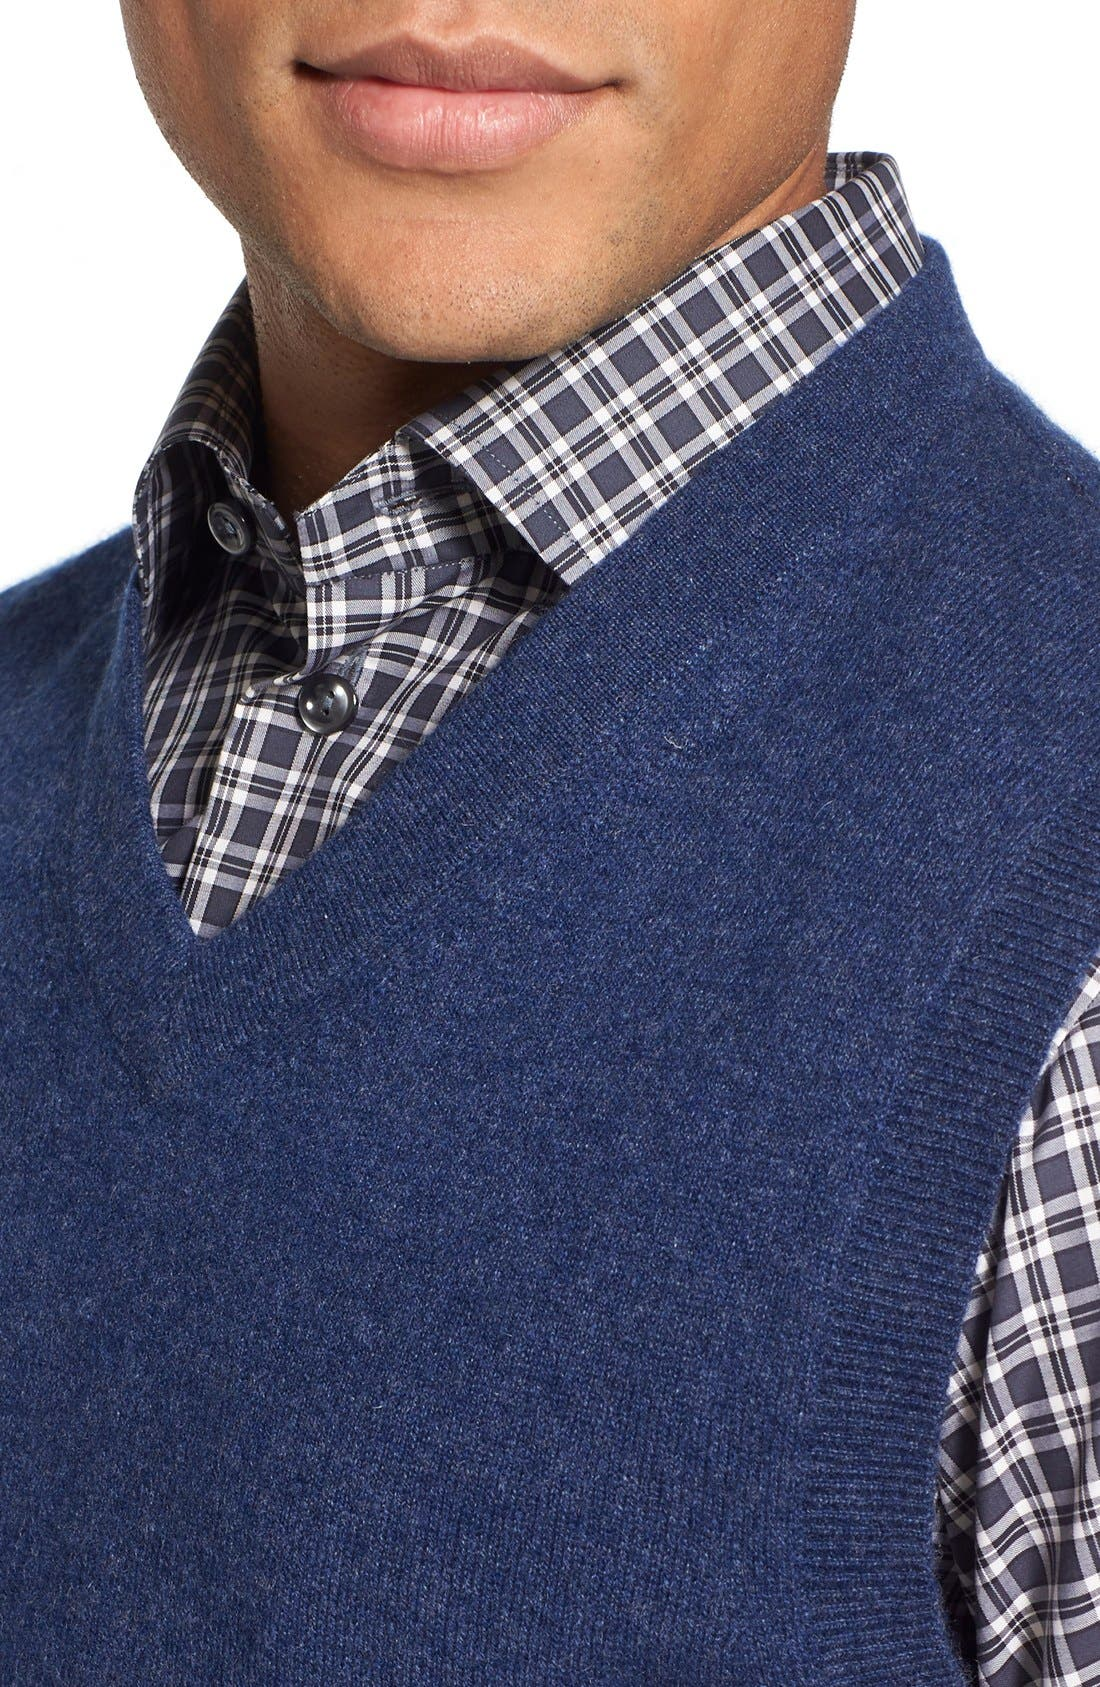 Cashmere V-Neck Sweater Vest,                             Alternate thumbnail 8, color,                             BLUE ESTATE HEATHER